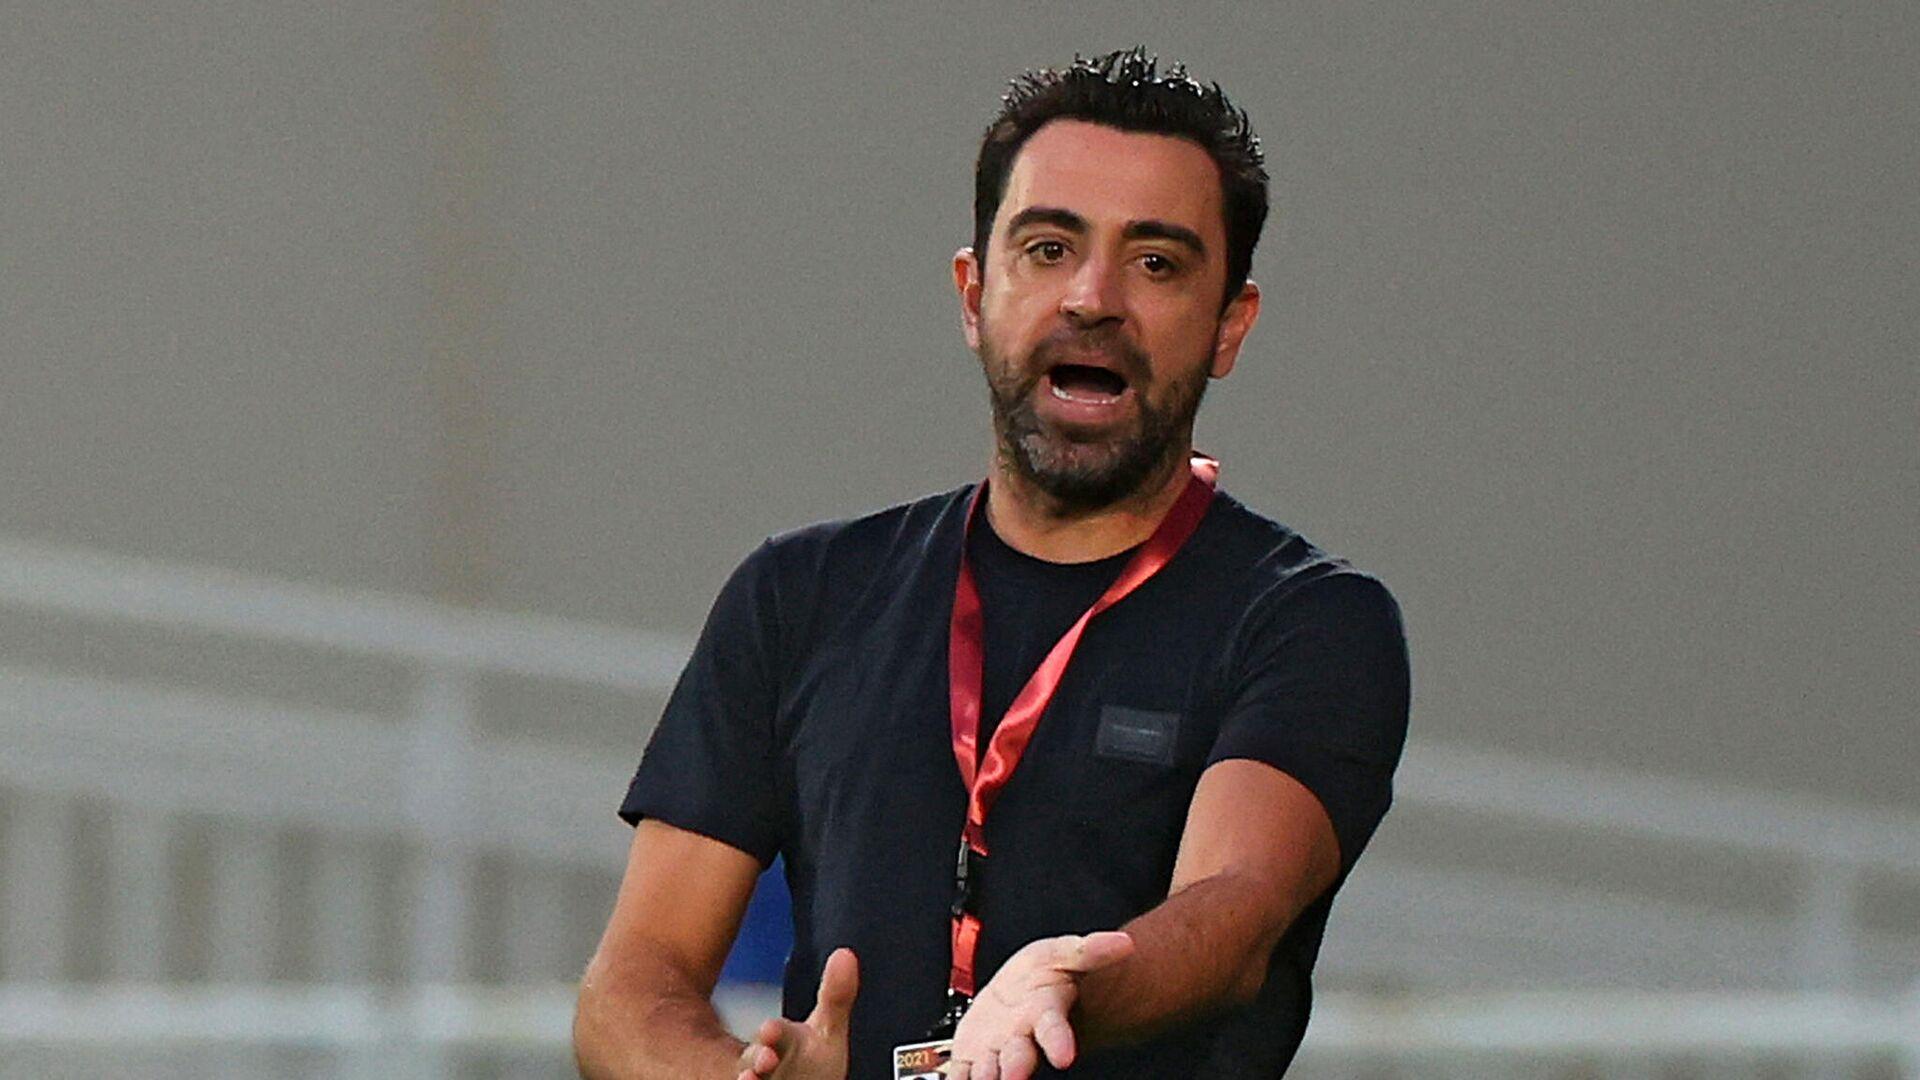 Sadd's coach Xavi Hernandez speaks to his player during the Qatar Cup semi-final football match between Al-Rayyan and Al-Sadd at the Abdullah bin Khalifa Stadium in the capital Doha on February 18, 2021. (Photo by KARIM JAAFAR / AFP) - РИА Новости, 1920, 13.05.2021